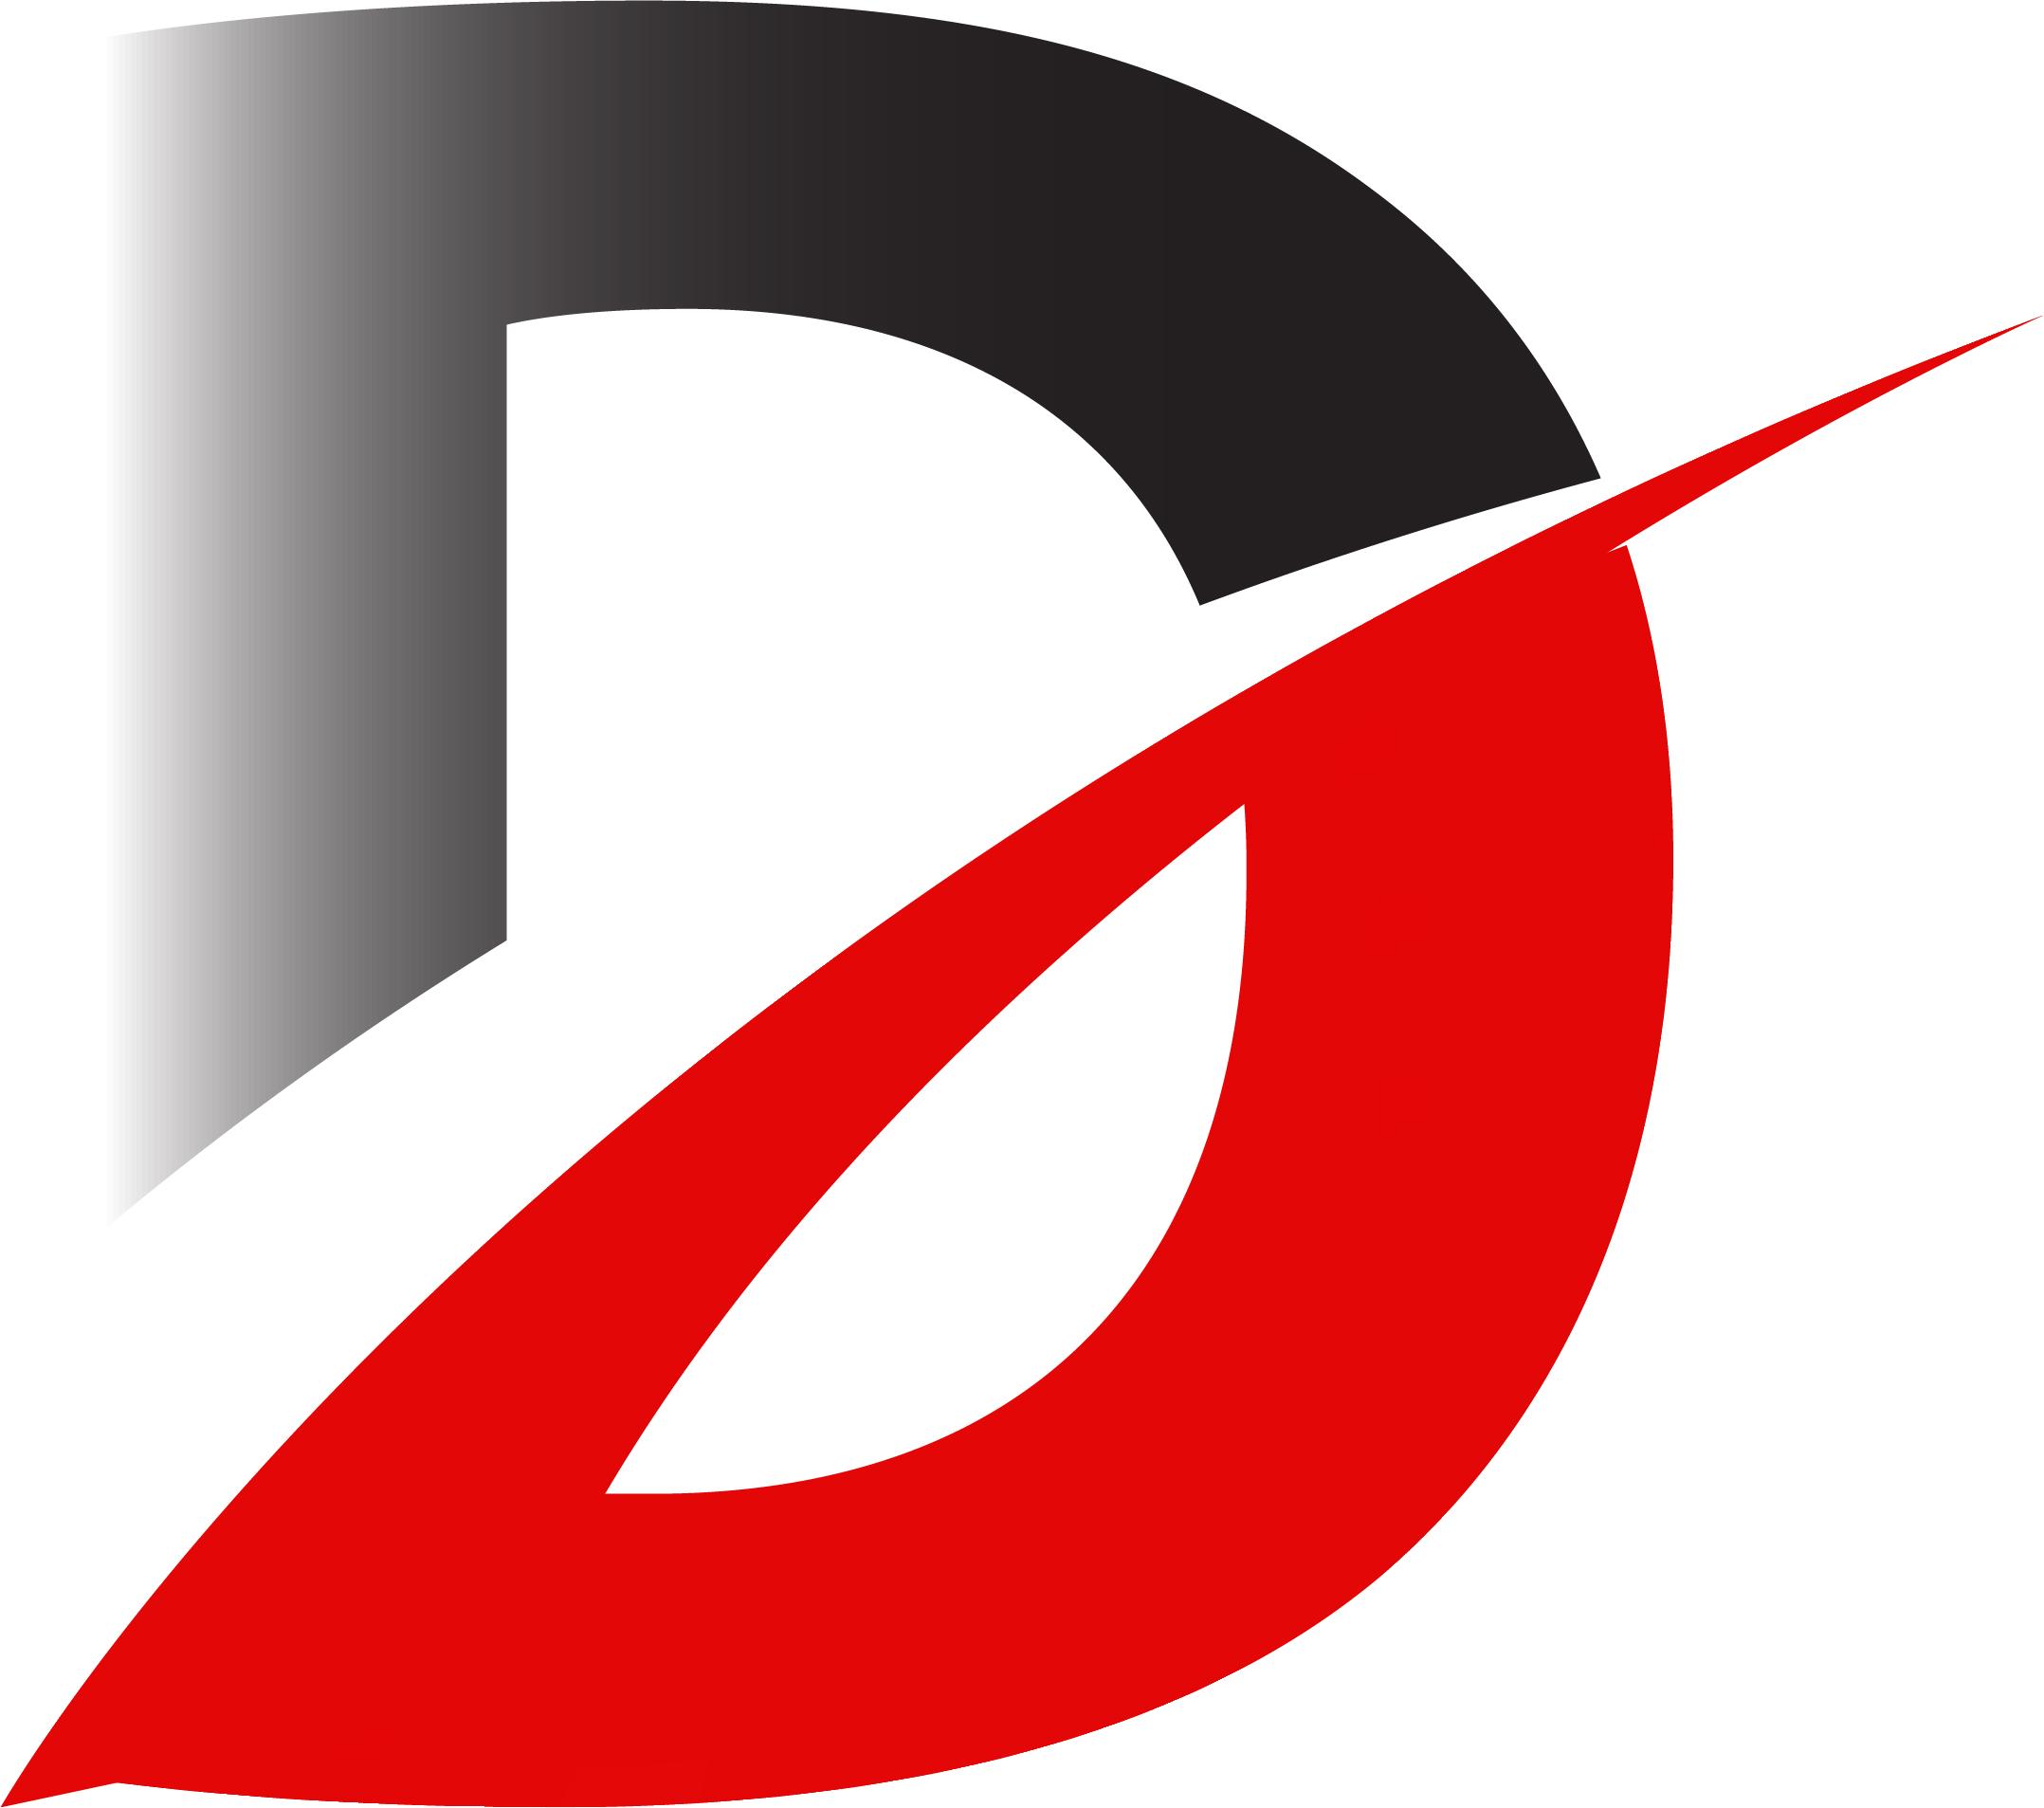 I will do simple and minimum logo design